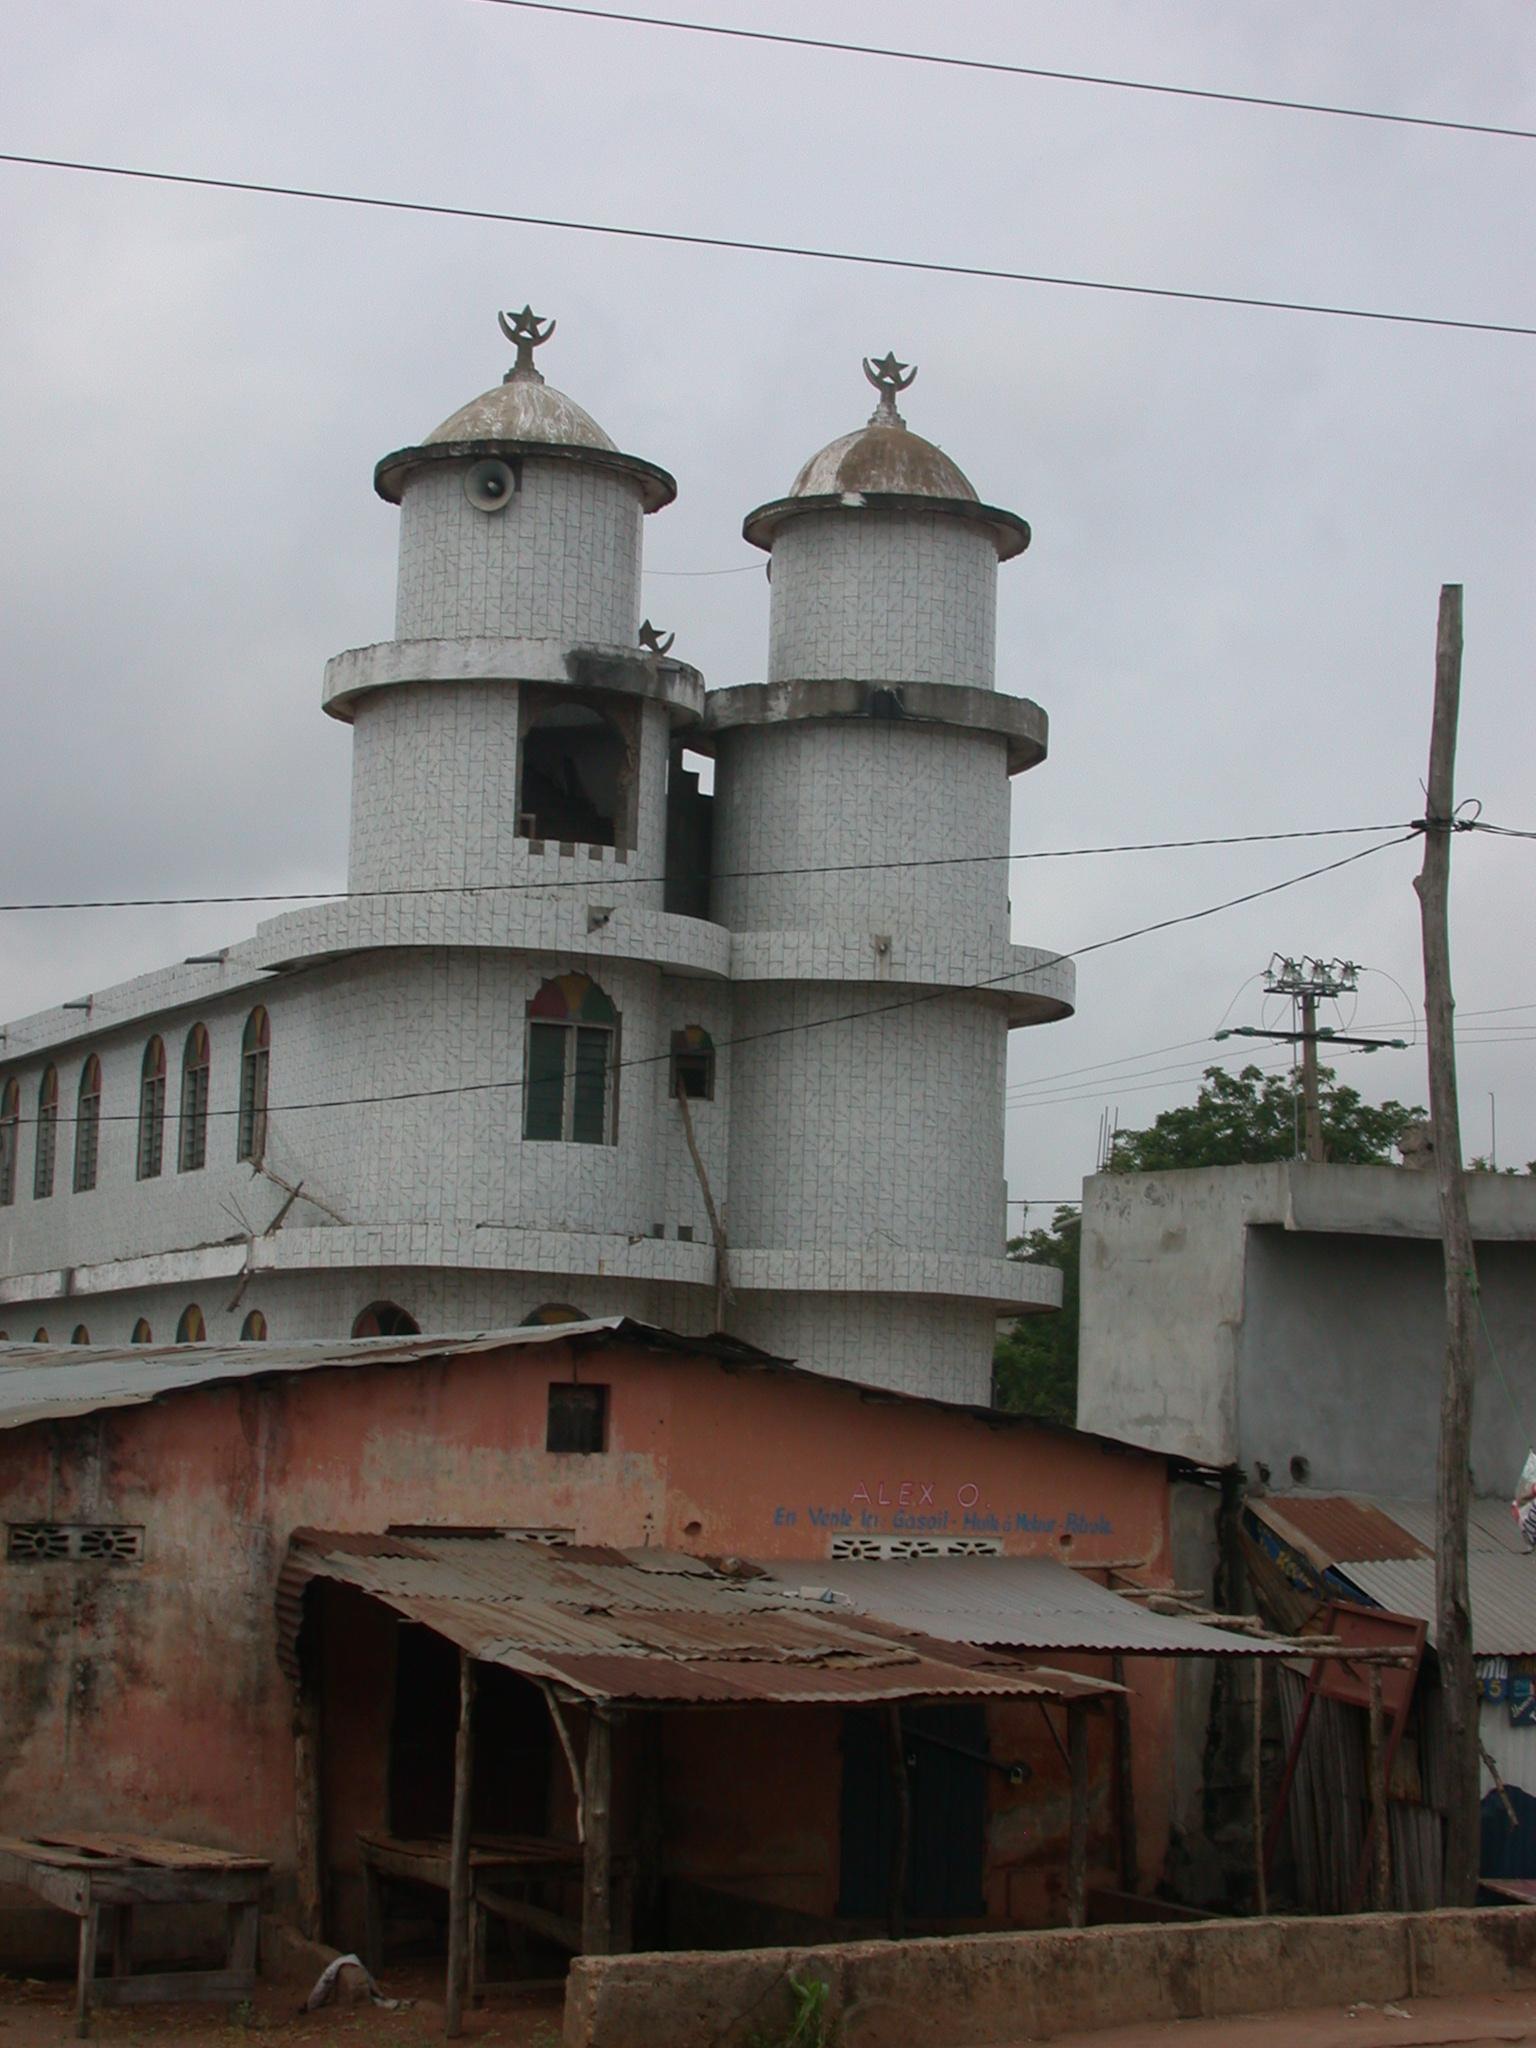 Mosque, Porto Novo, Benin